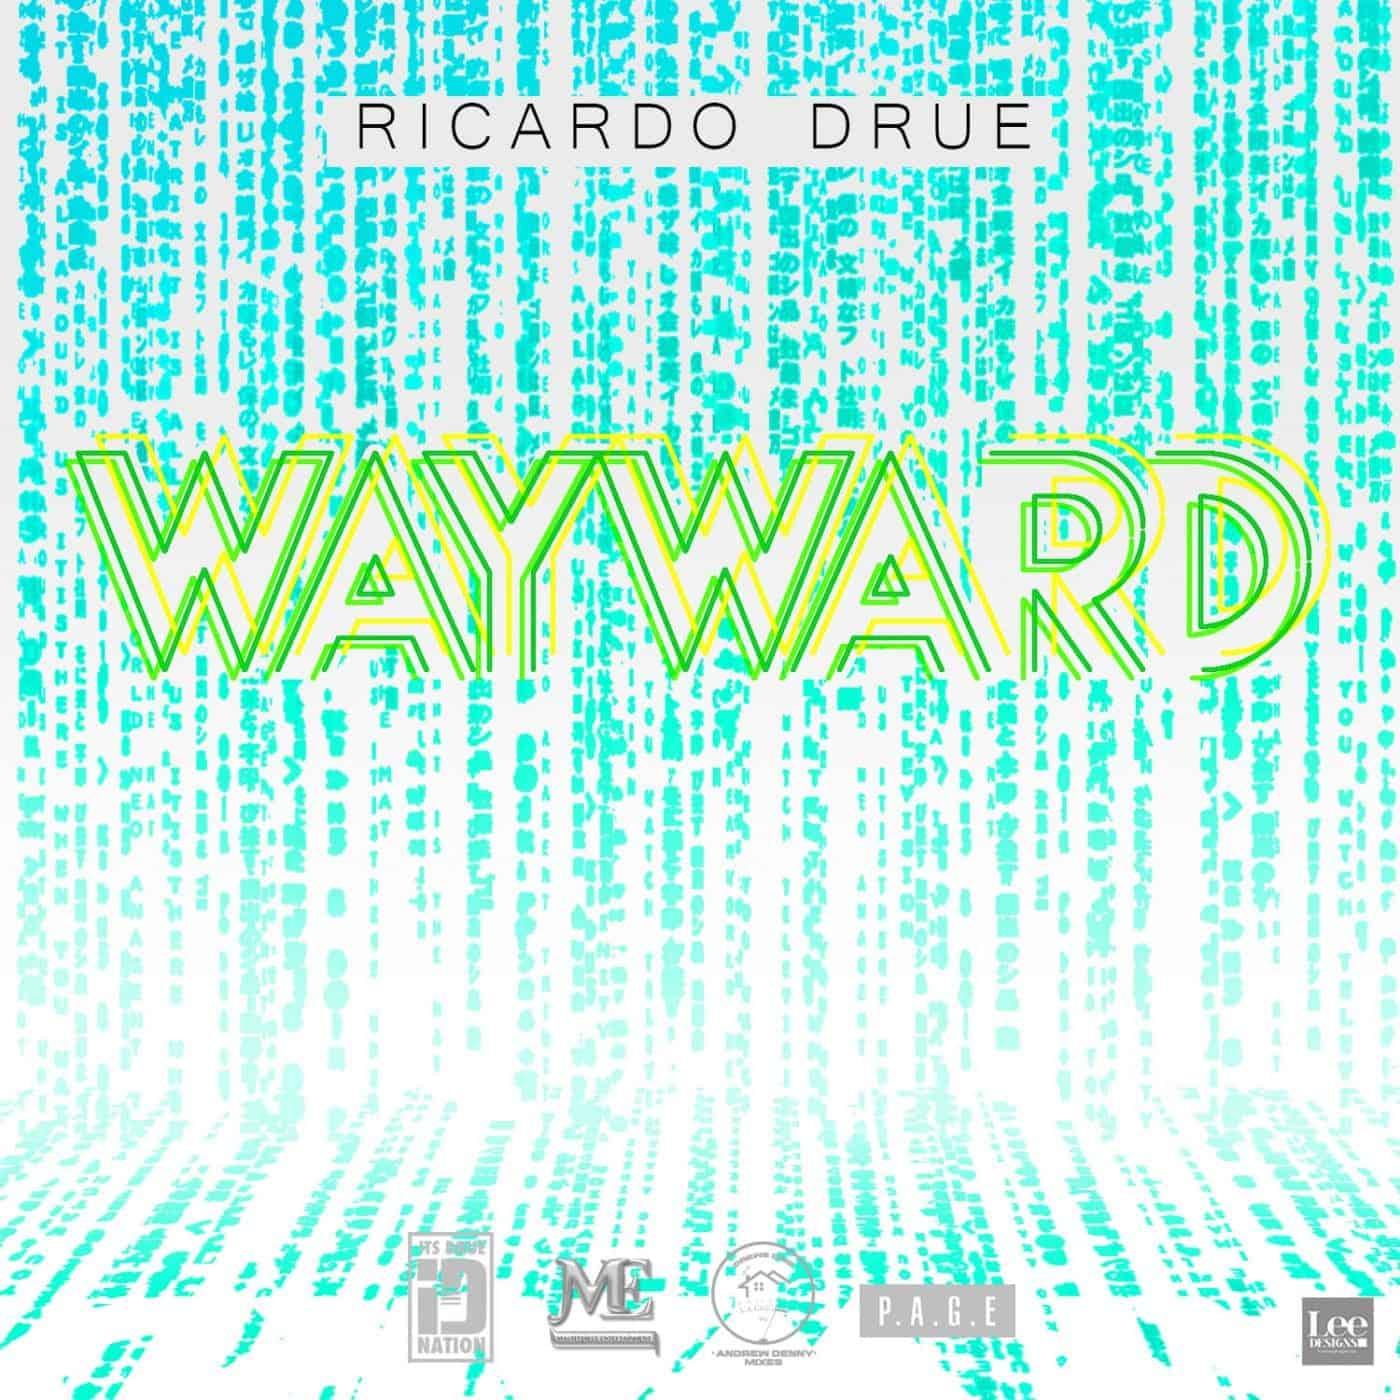 Ricardo Drue - WayWard (Put Yuh Back In It)